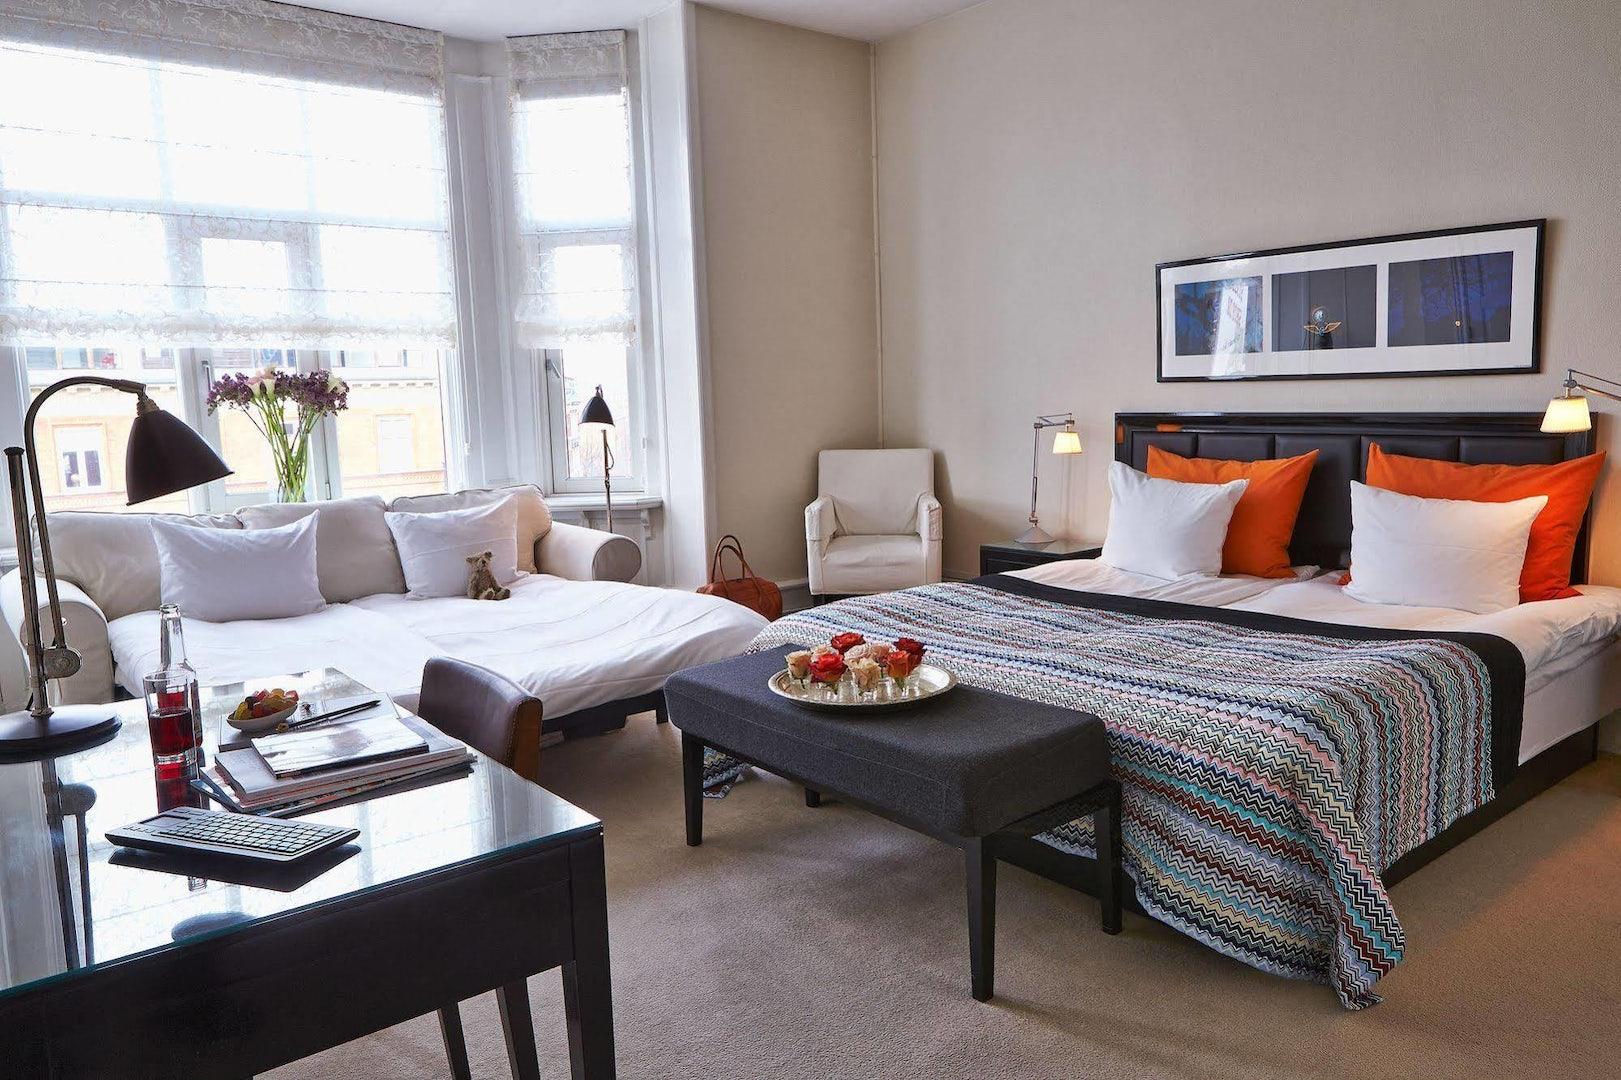 avenue hotel room copenhagen